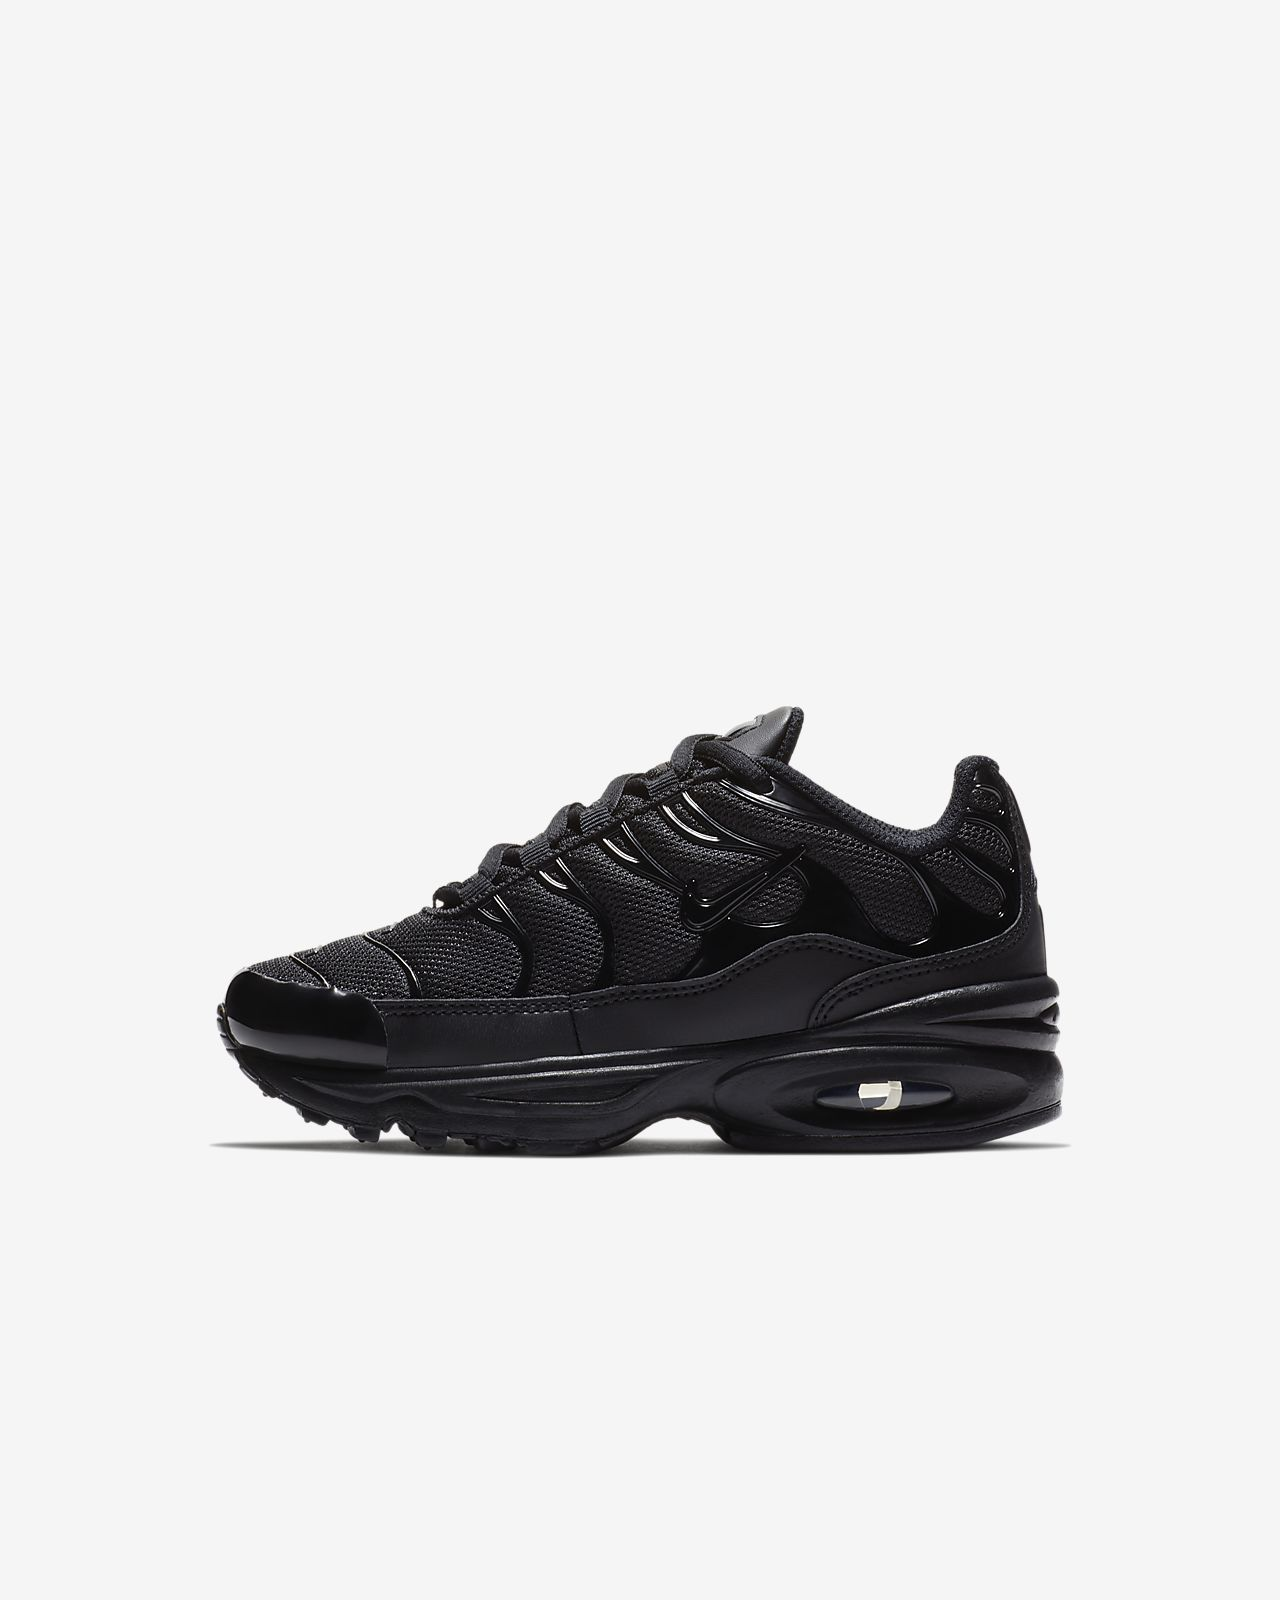 separation shoes 06e83 fa6f4 czech nike air max 2016 f92cd 9fddb  official store nike air max plus küçük  Çocuk ayakkabs 03d2e 40a7f